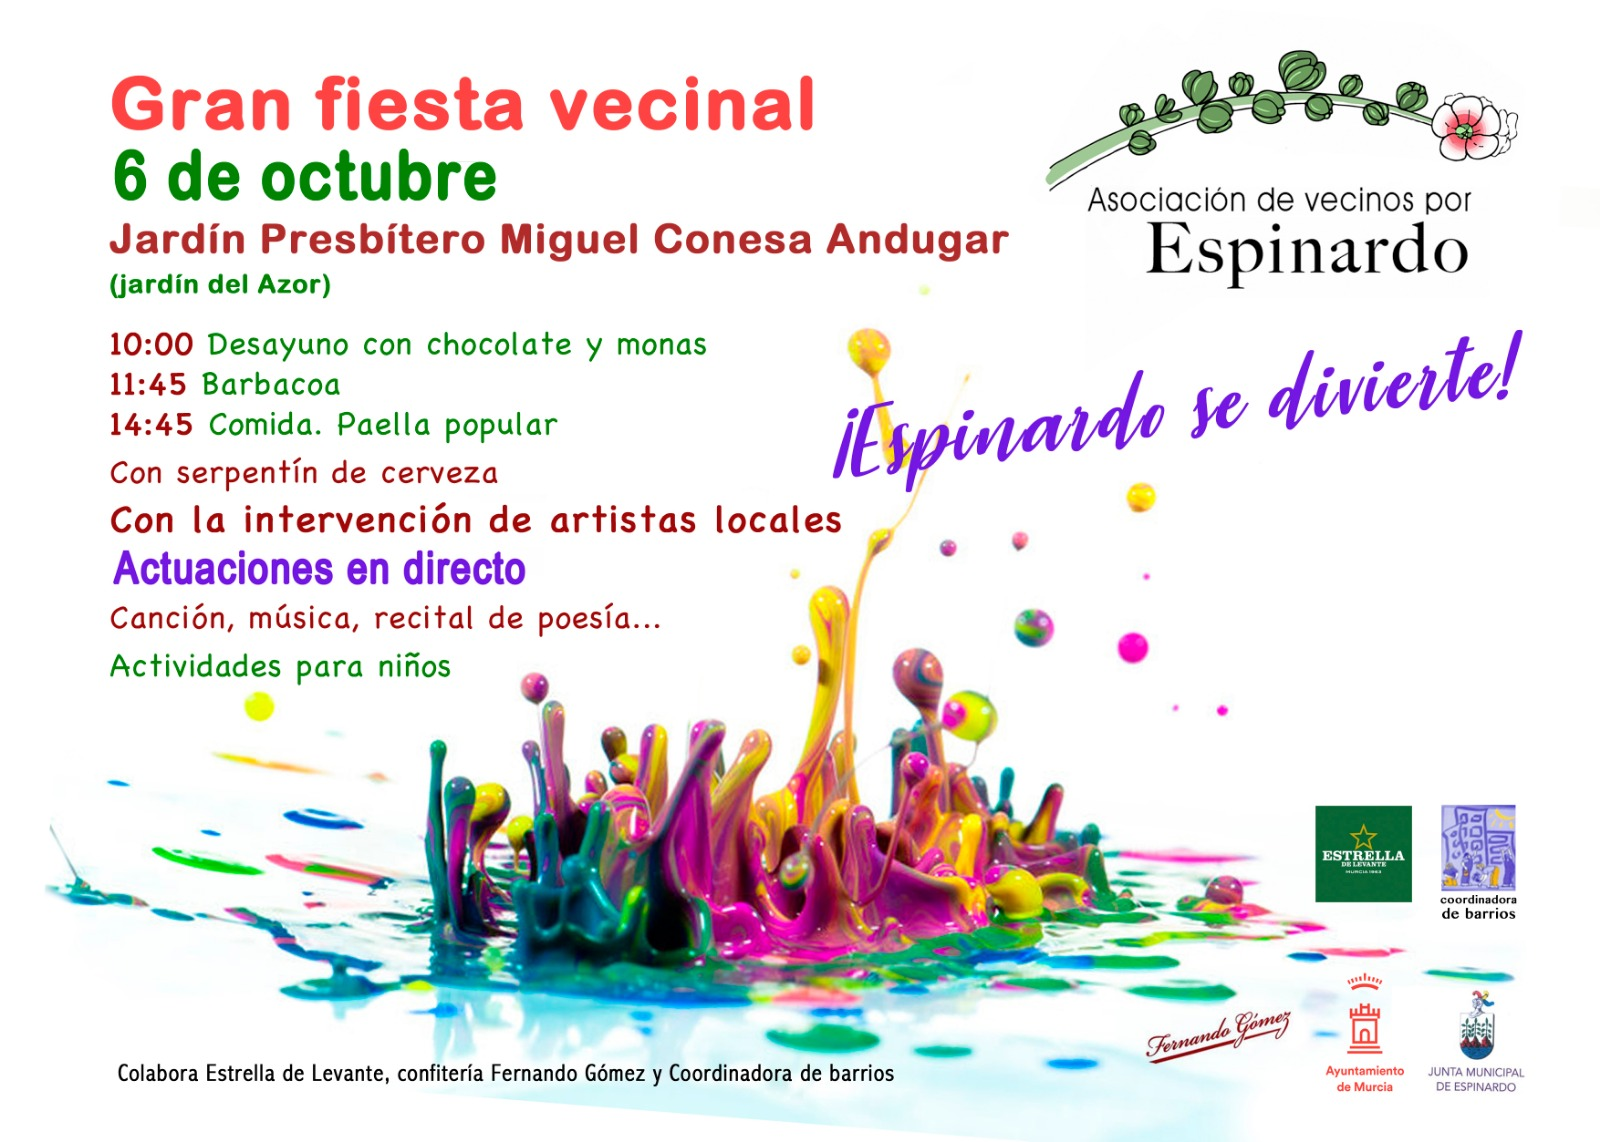 2018-10-06 Cartel Gran Fiesta Vecinal - Asociación de Vecinos por Espinardo